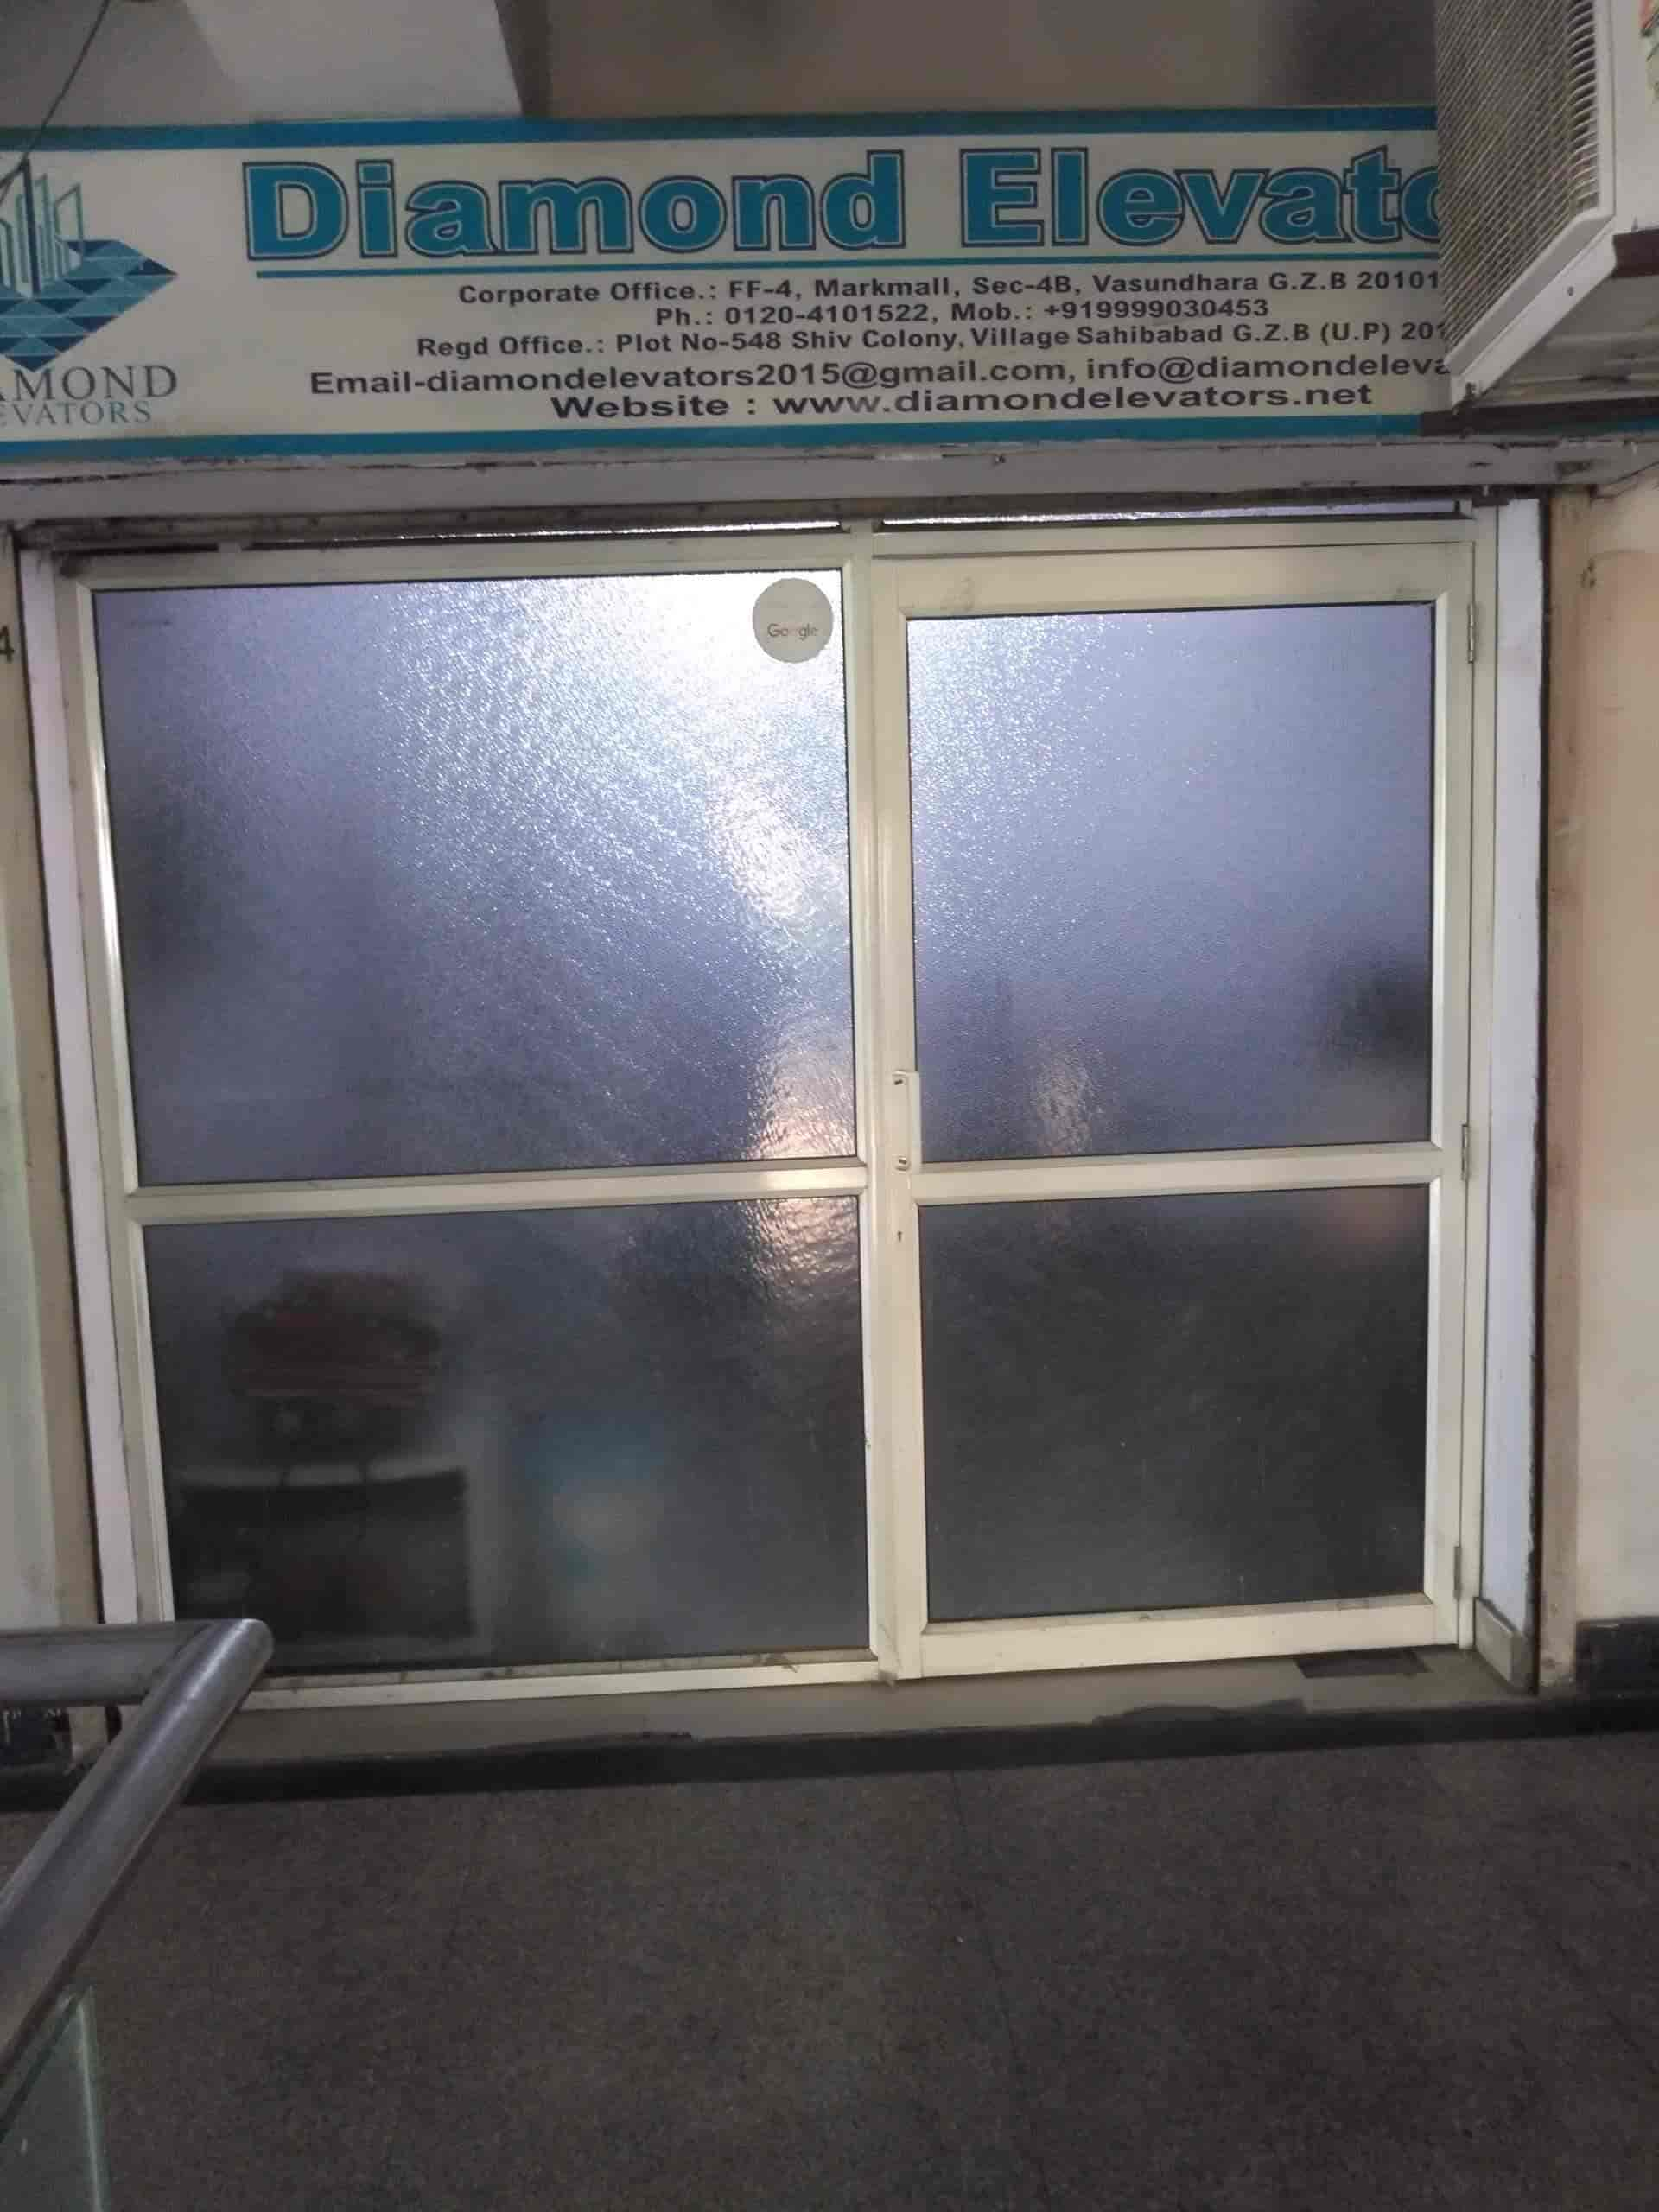 Top Elevator Maintenance Services in Brahmapuram, Ernakulam